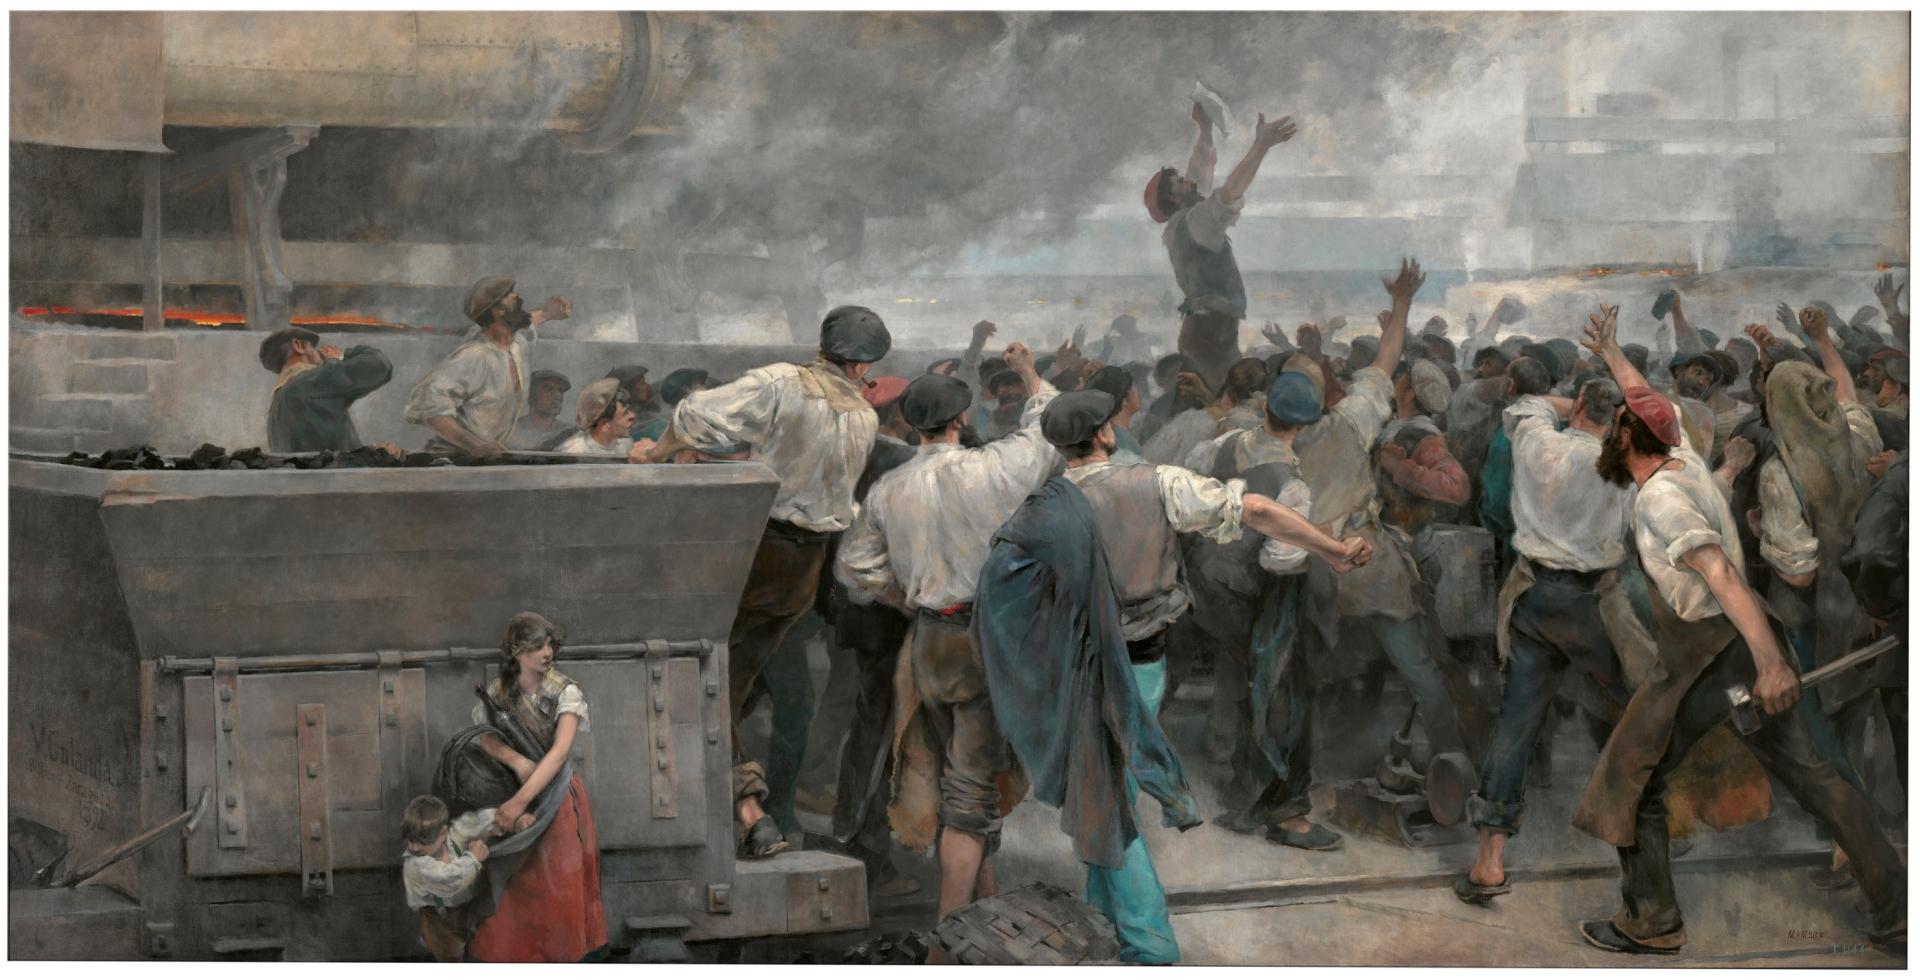 Vicente Cutanda. Vaga d'obrers a Biscaia, 1892.